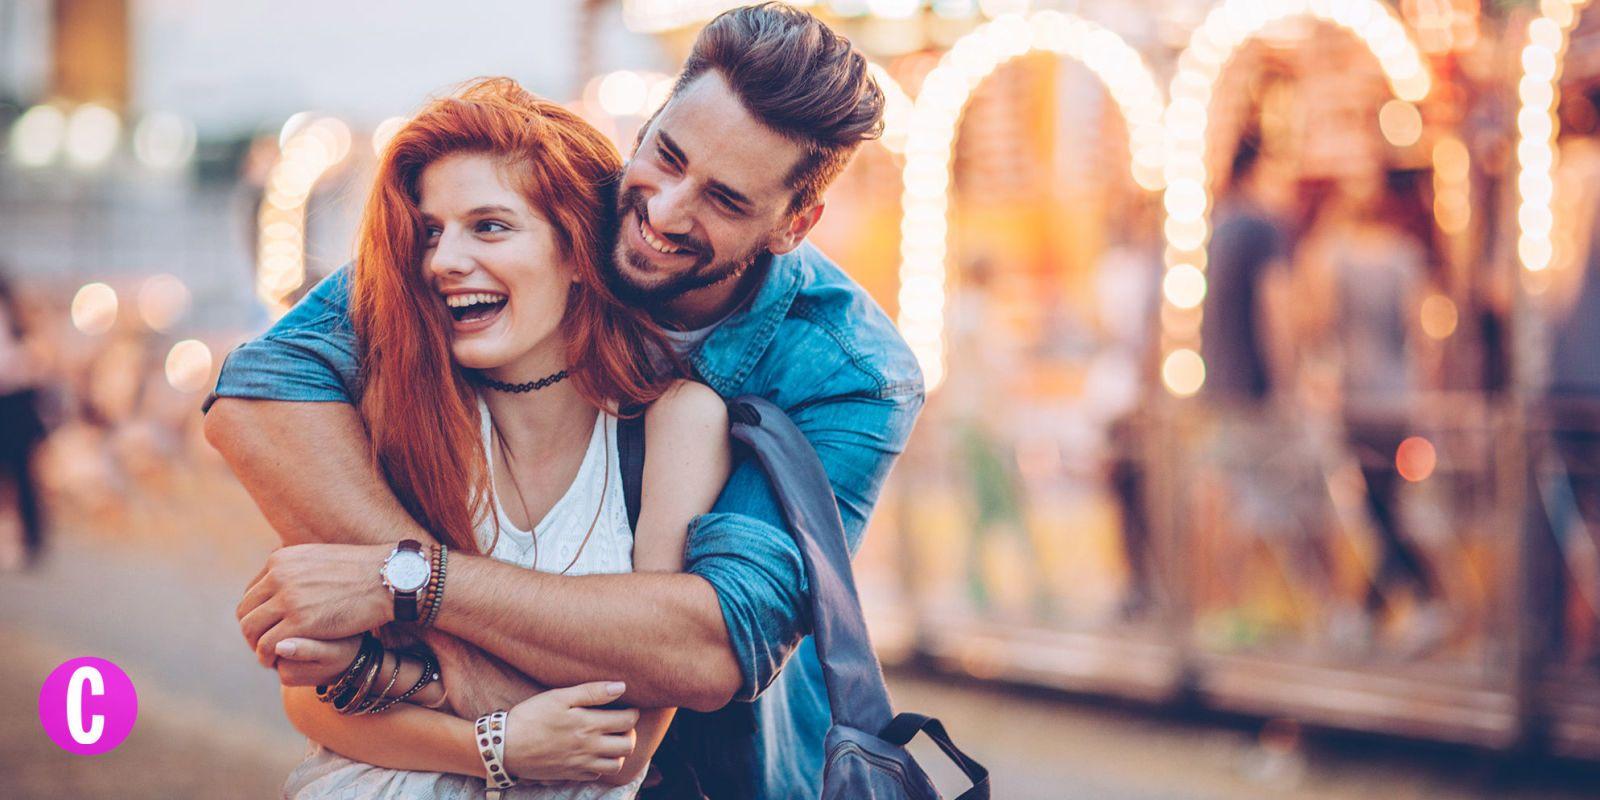 film gay italiani gratis frasi x sedurre un uomo